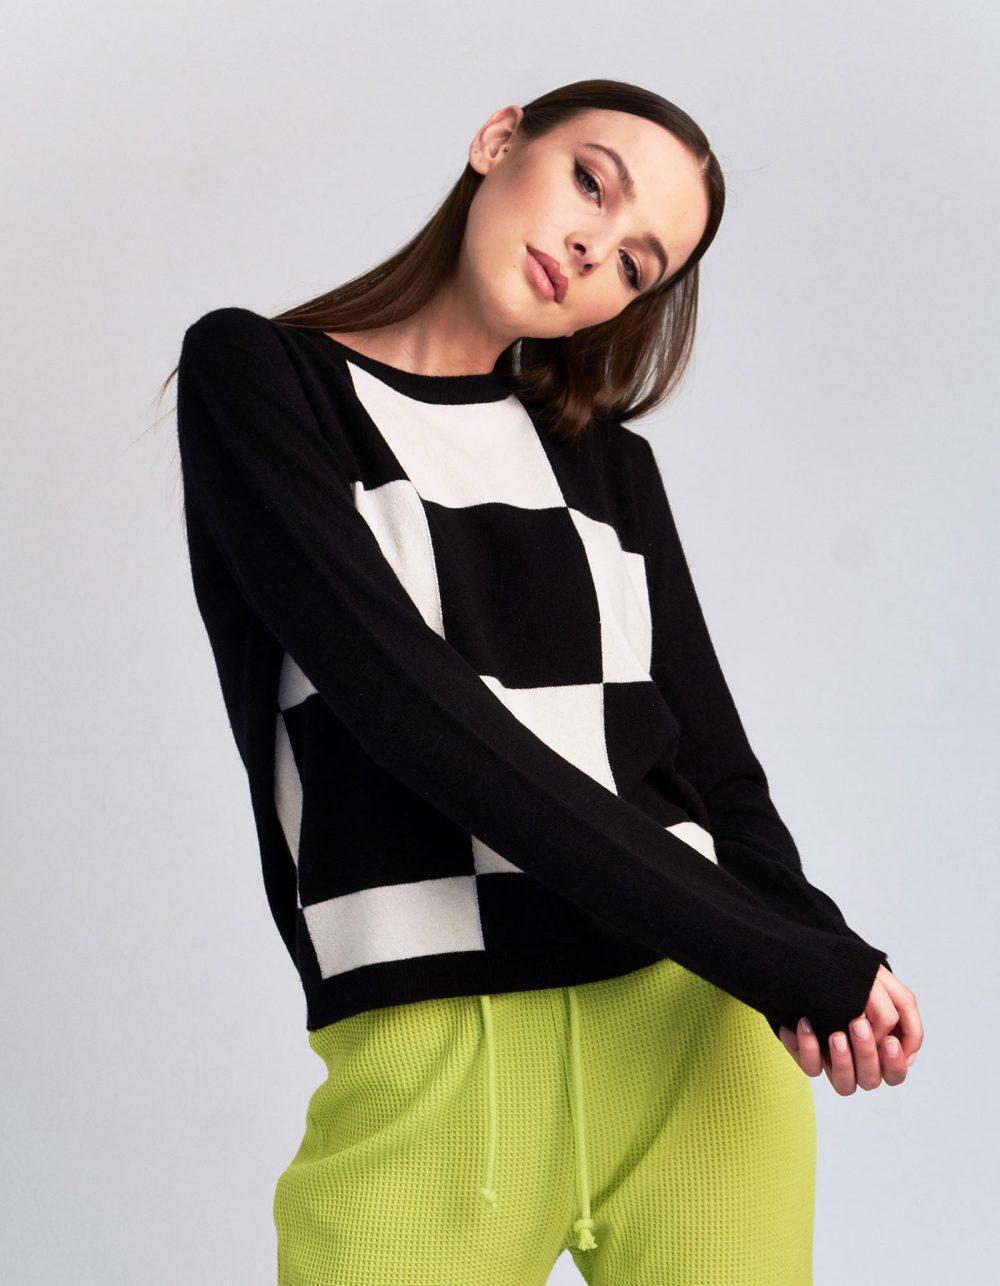 A model wearing the Gambit cashmere jumper, a malin darlin womens cashmere knitwear style.